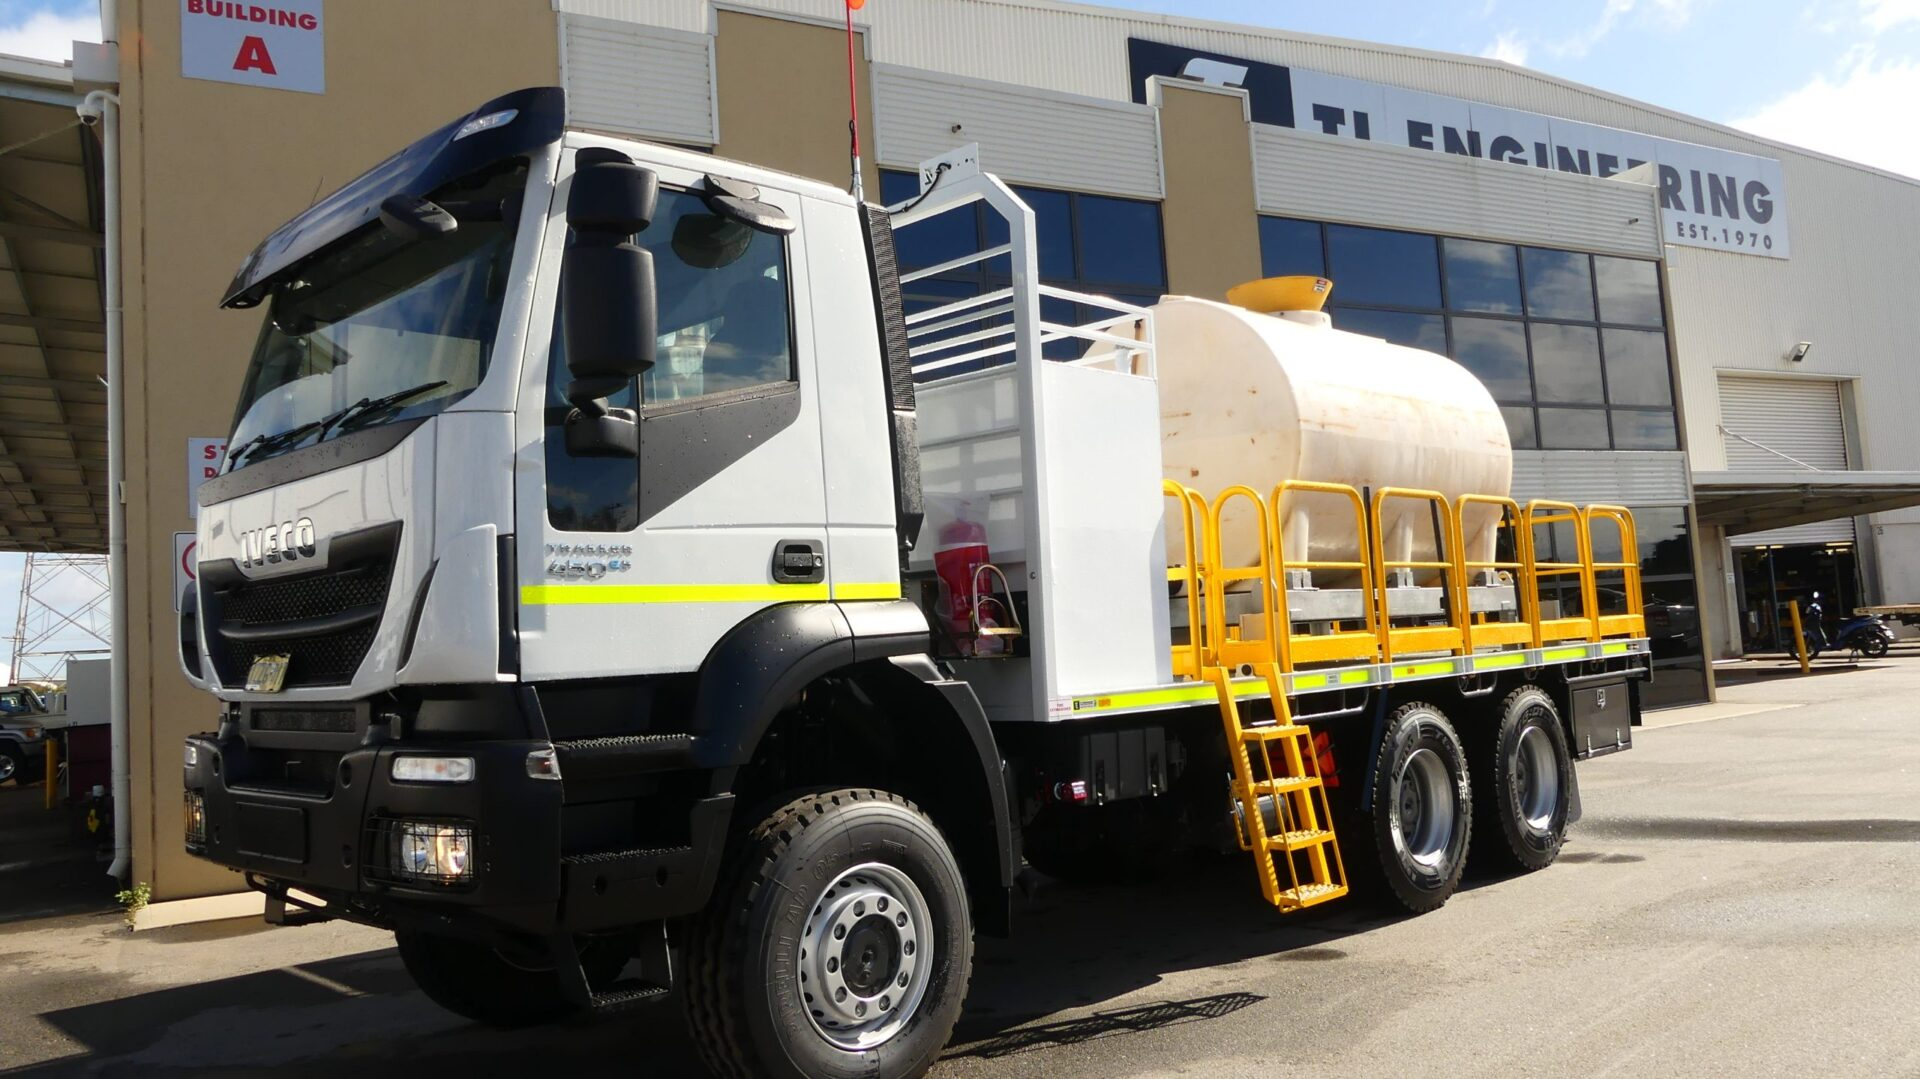 Custom made mining exploration drilling Service Truck for sale Perth WA